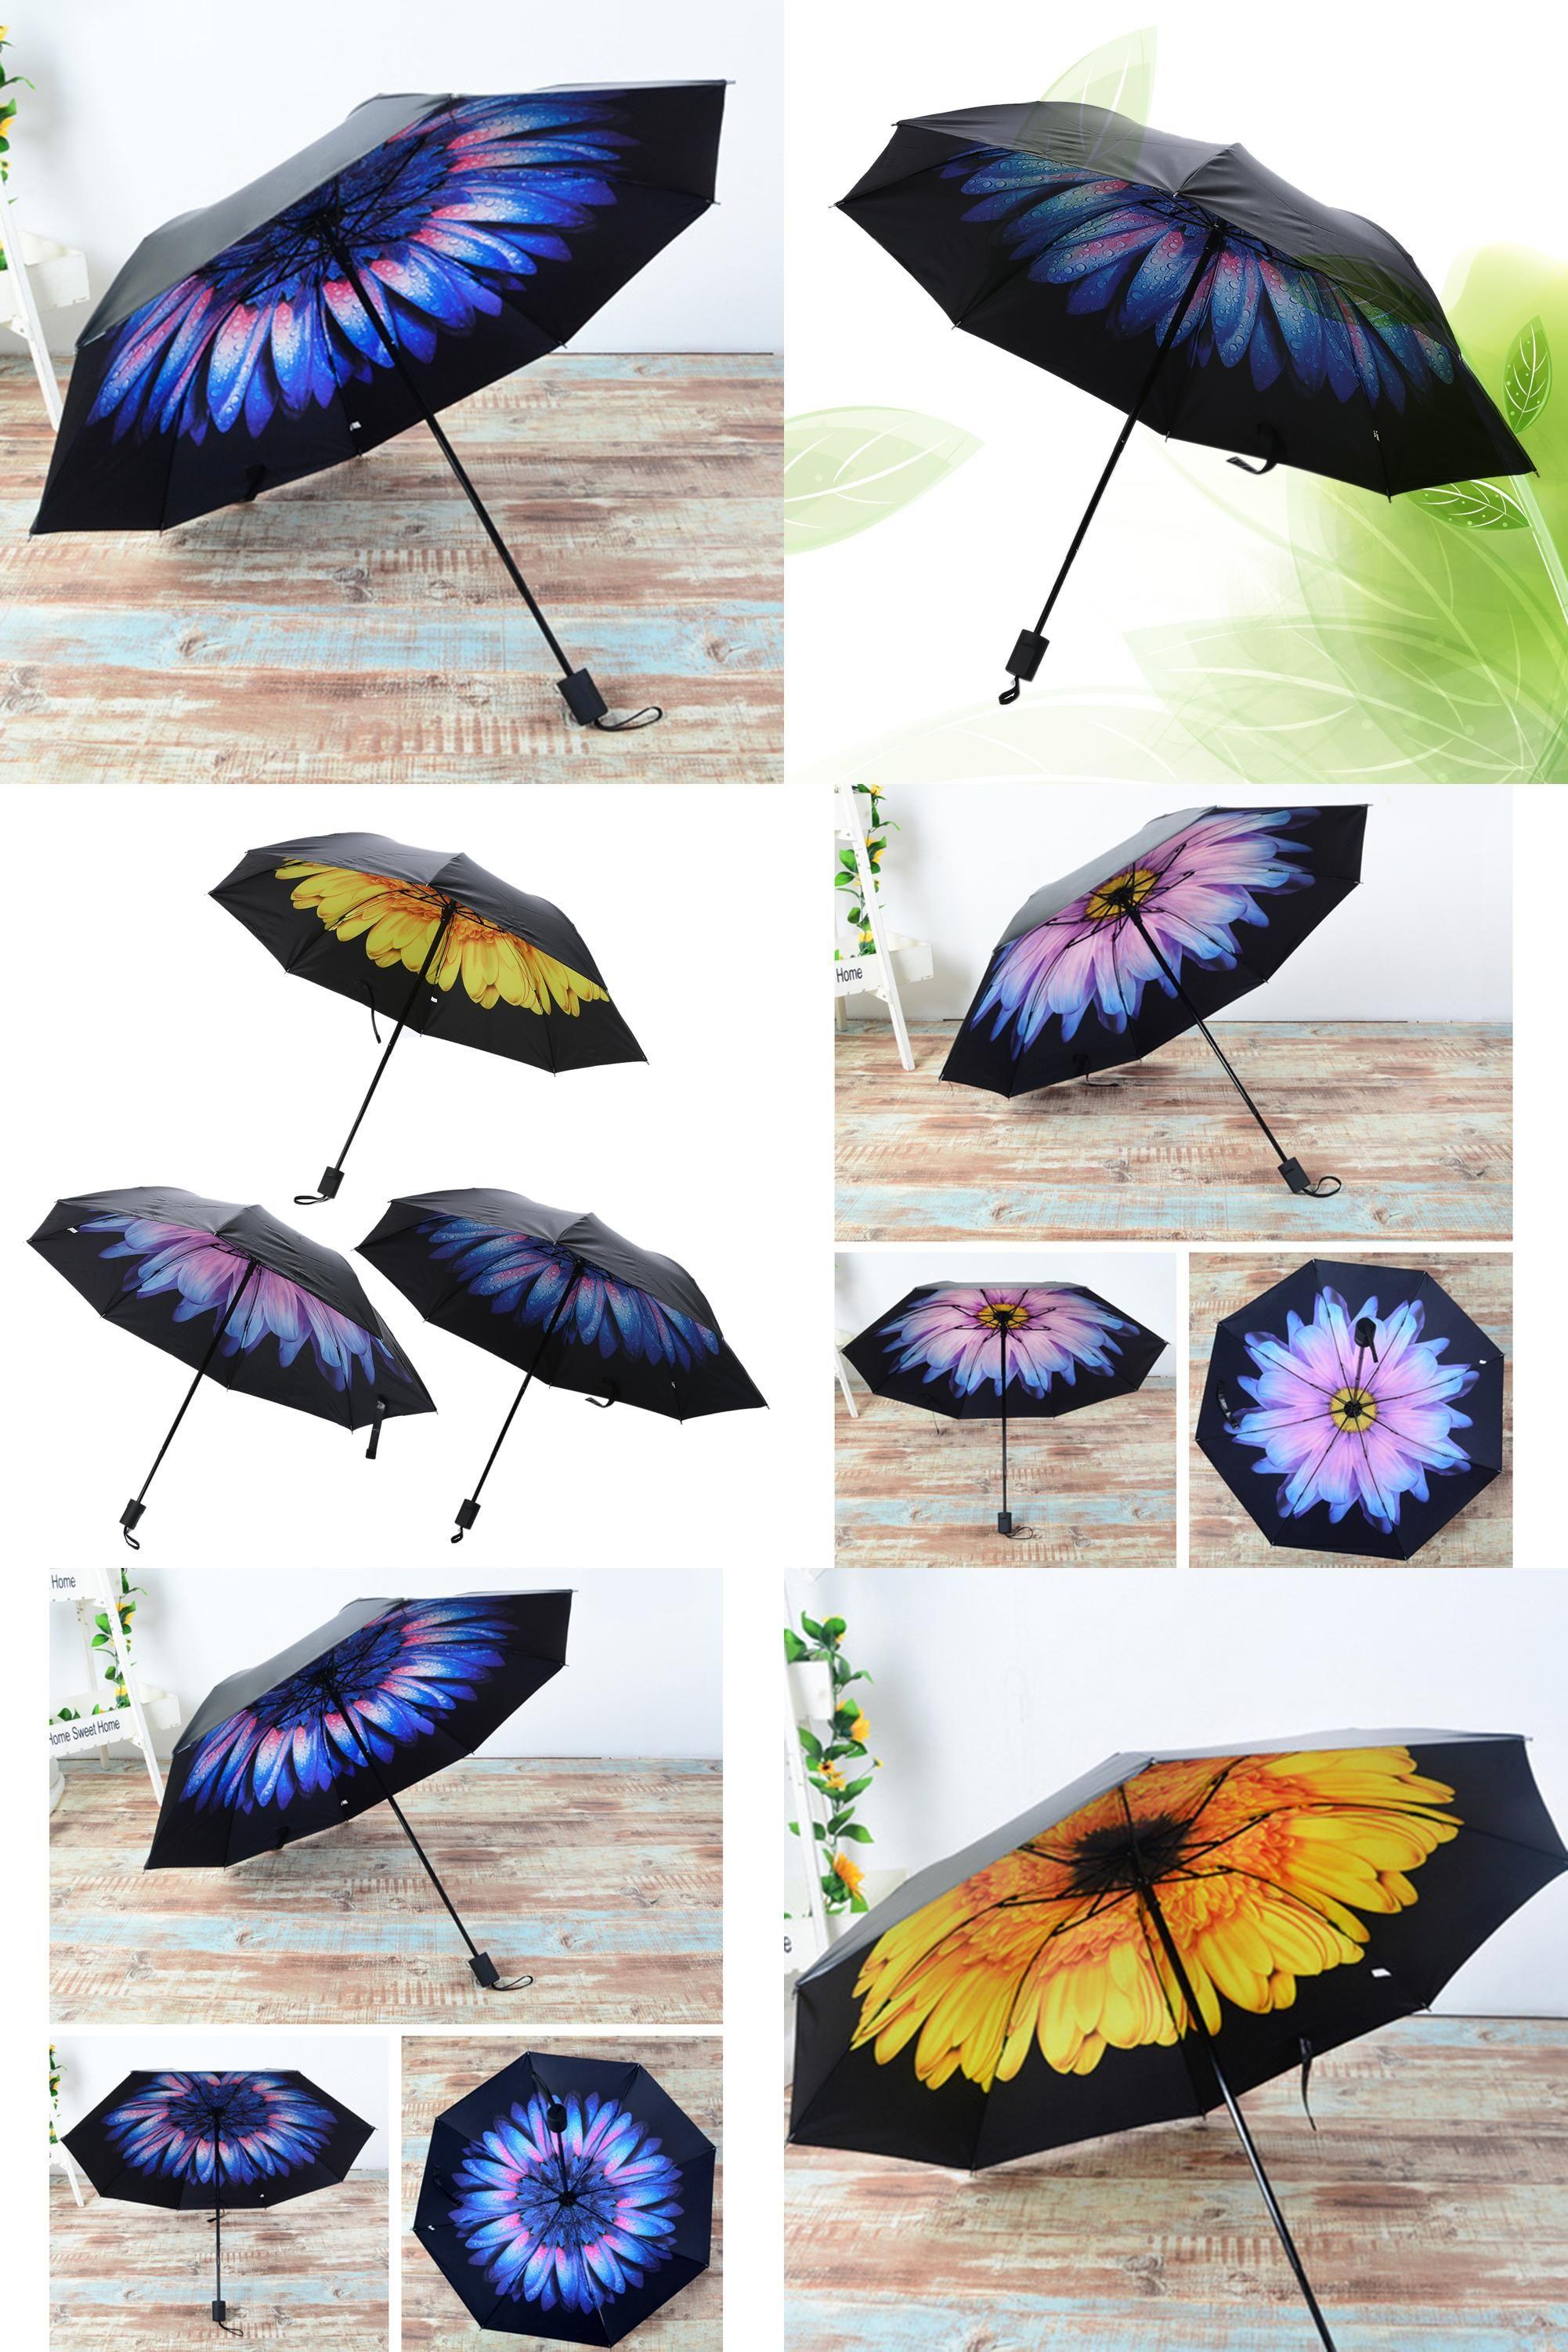 5918b145c [Visit to Buy] Rain Umbrellas Women Sun Vinyl Umbrella 3D Printed Sunny  Folding Umbrella Anti-UV Sunny and Rainy Umbrella Black Glue #Advertisement